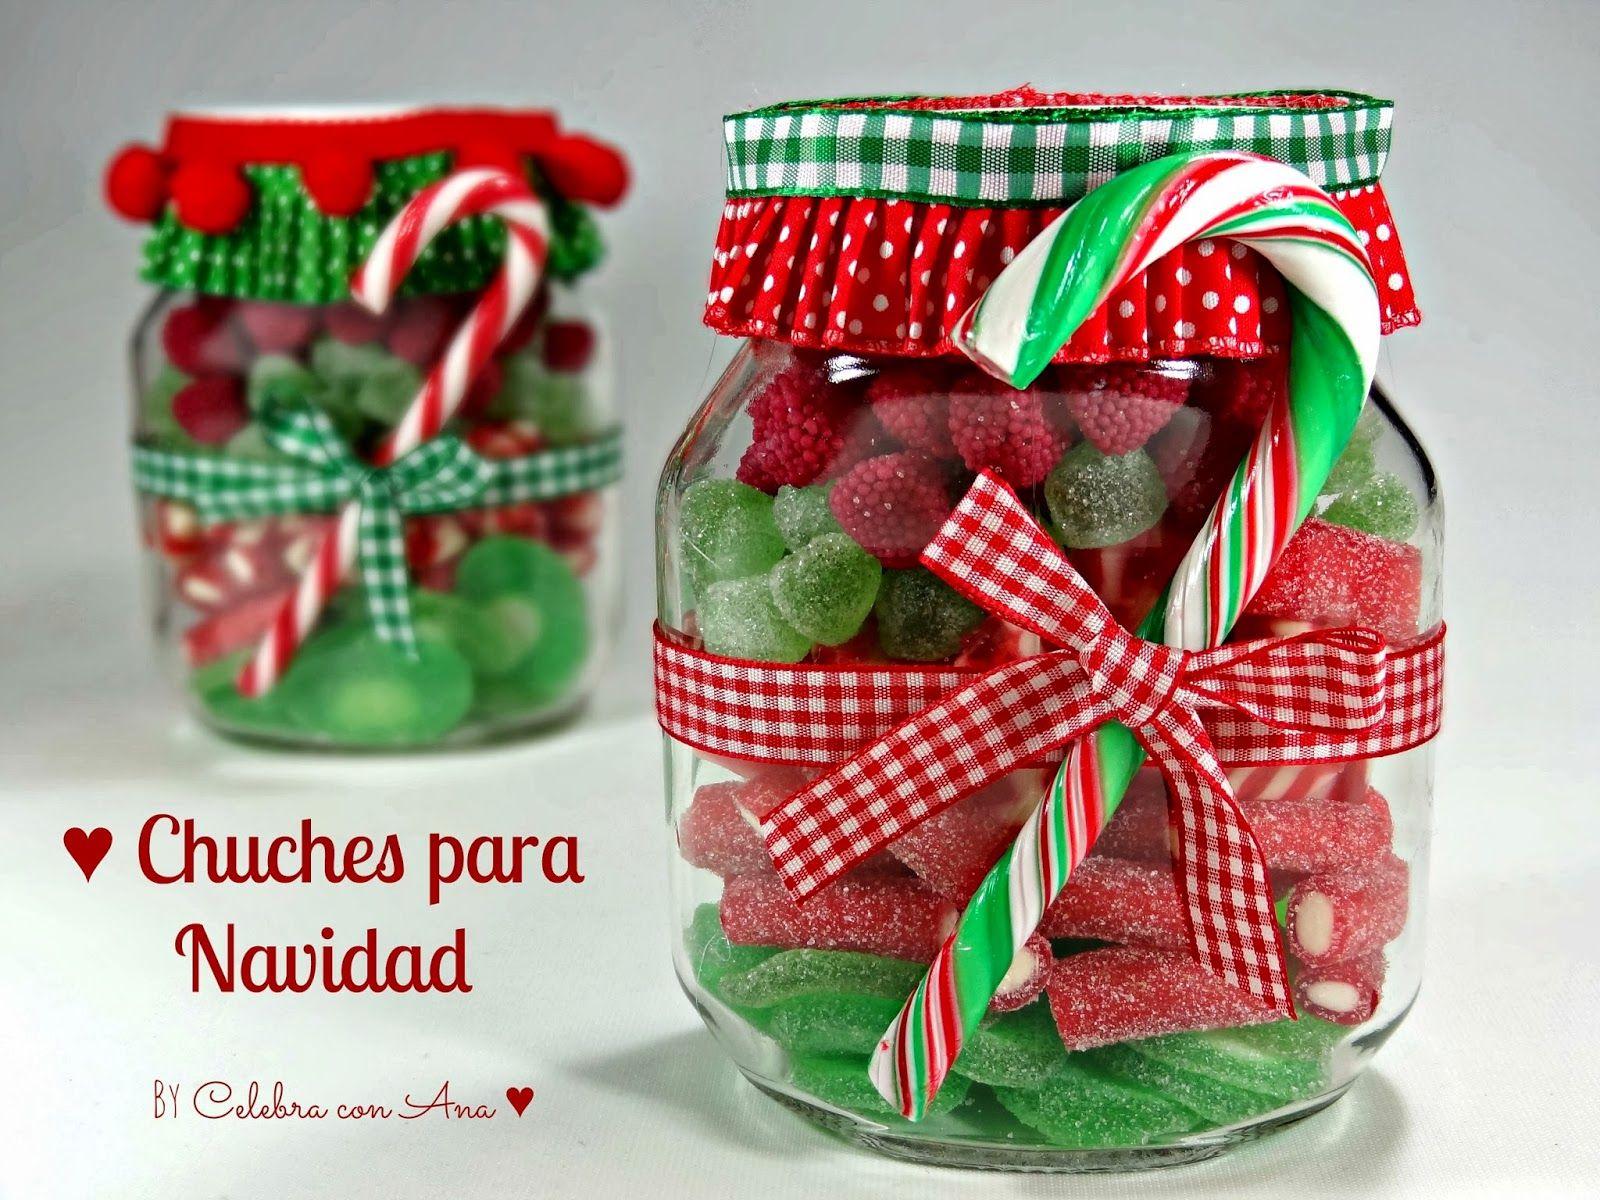 Botes de chuches navidad navidad pinterest bote for Frascos decorados para navidad